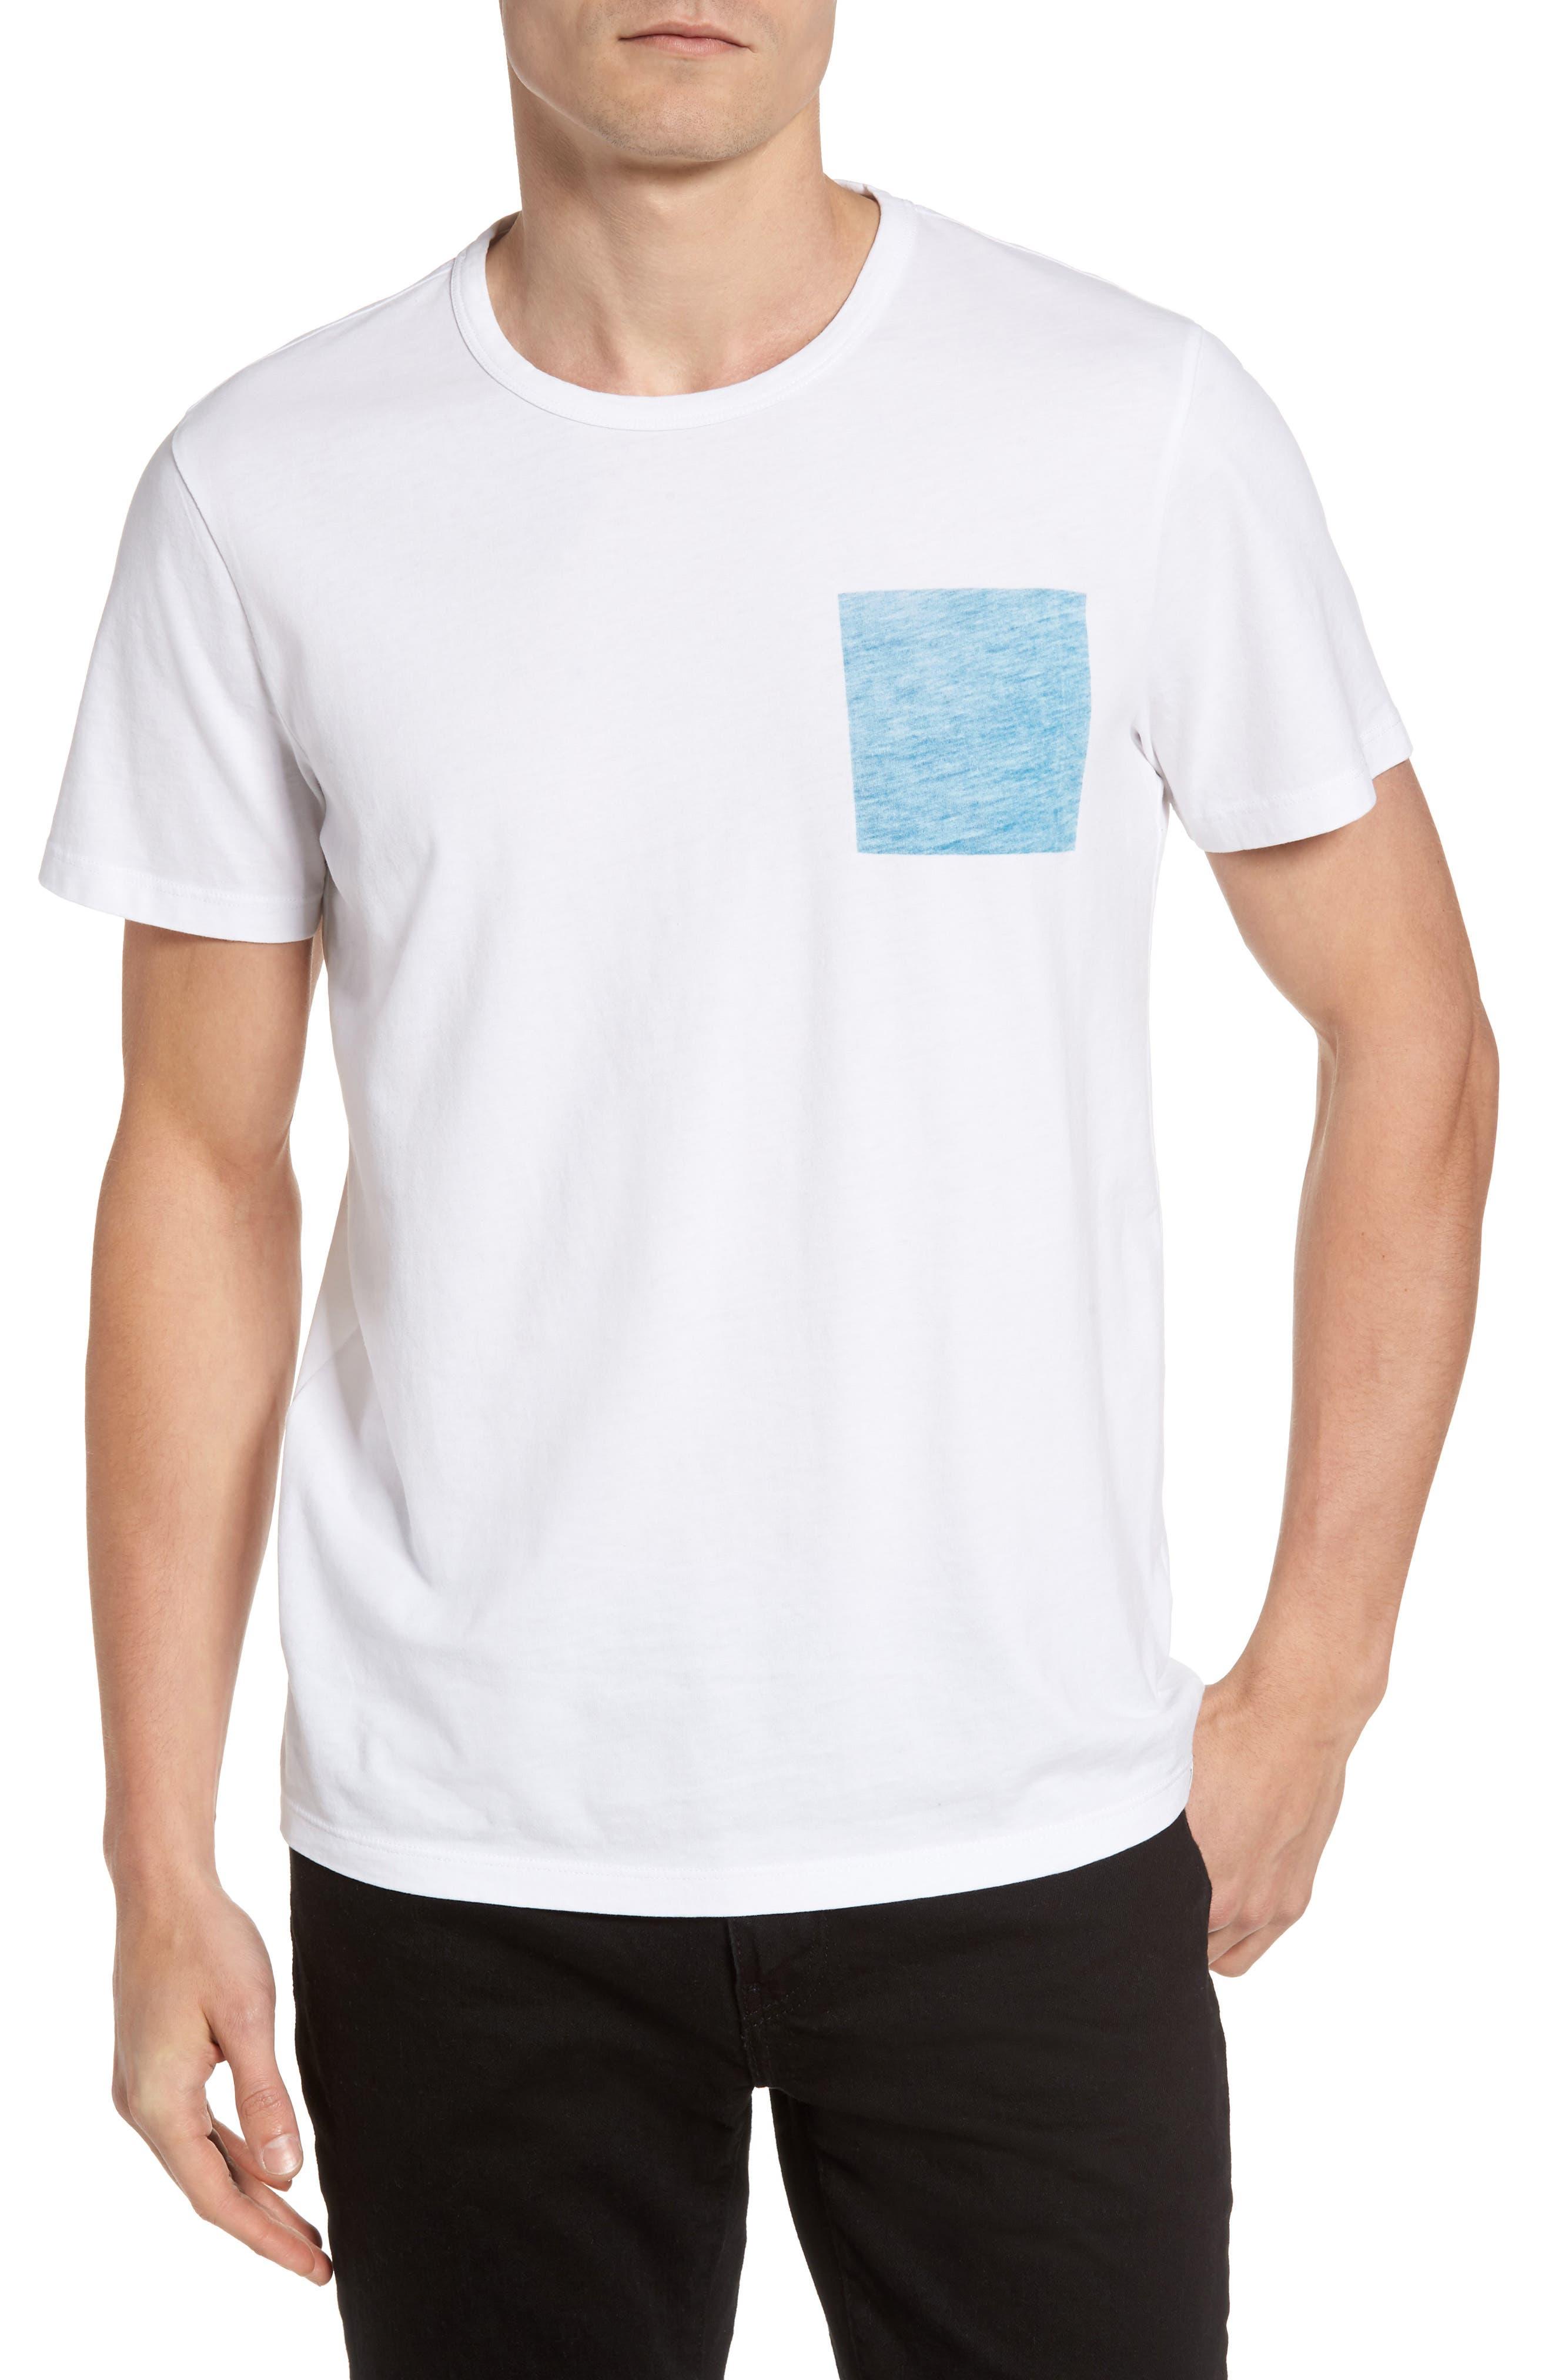 Jason Scott Blue Square T-Shirt